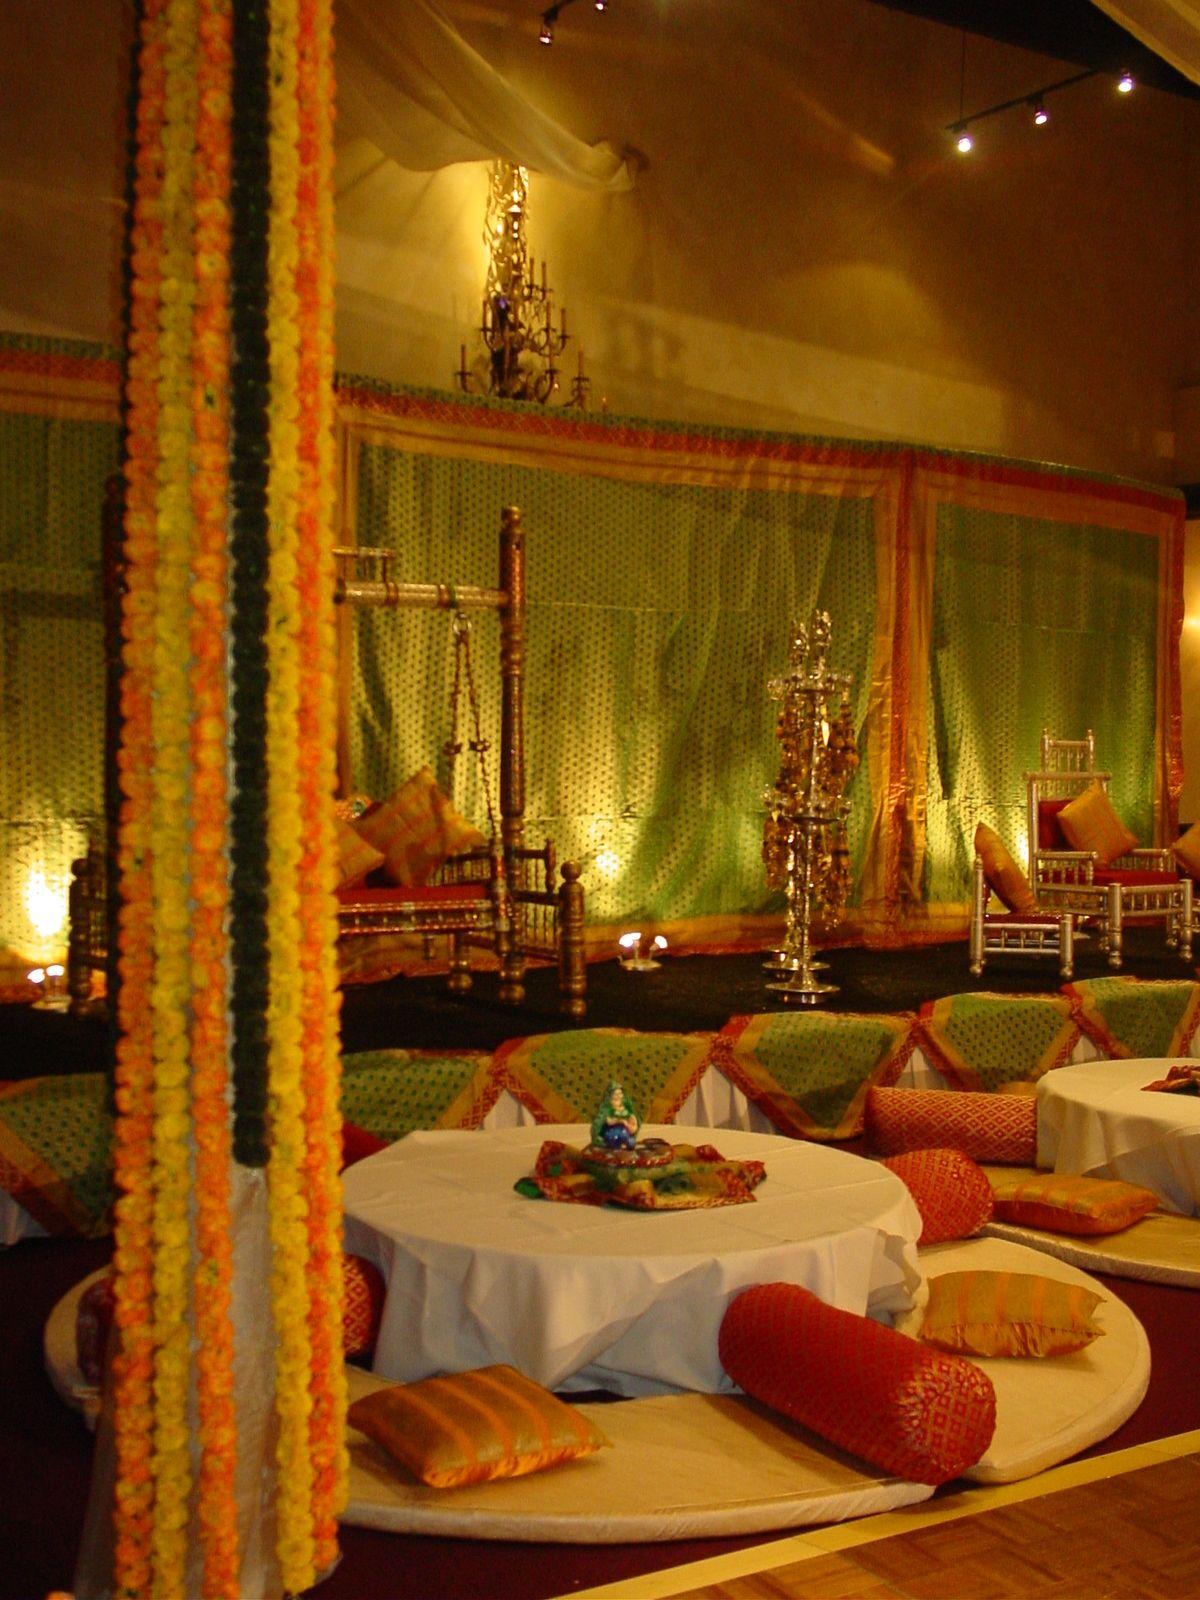 Hindu wedding decoration ideas  At Pelazzio FullService Wedding Special Events Venue we specialize